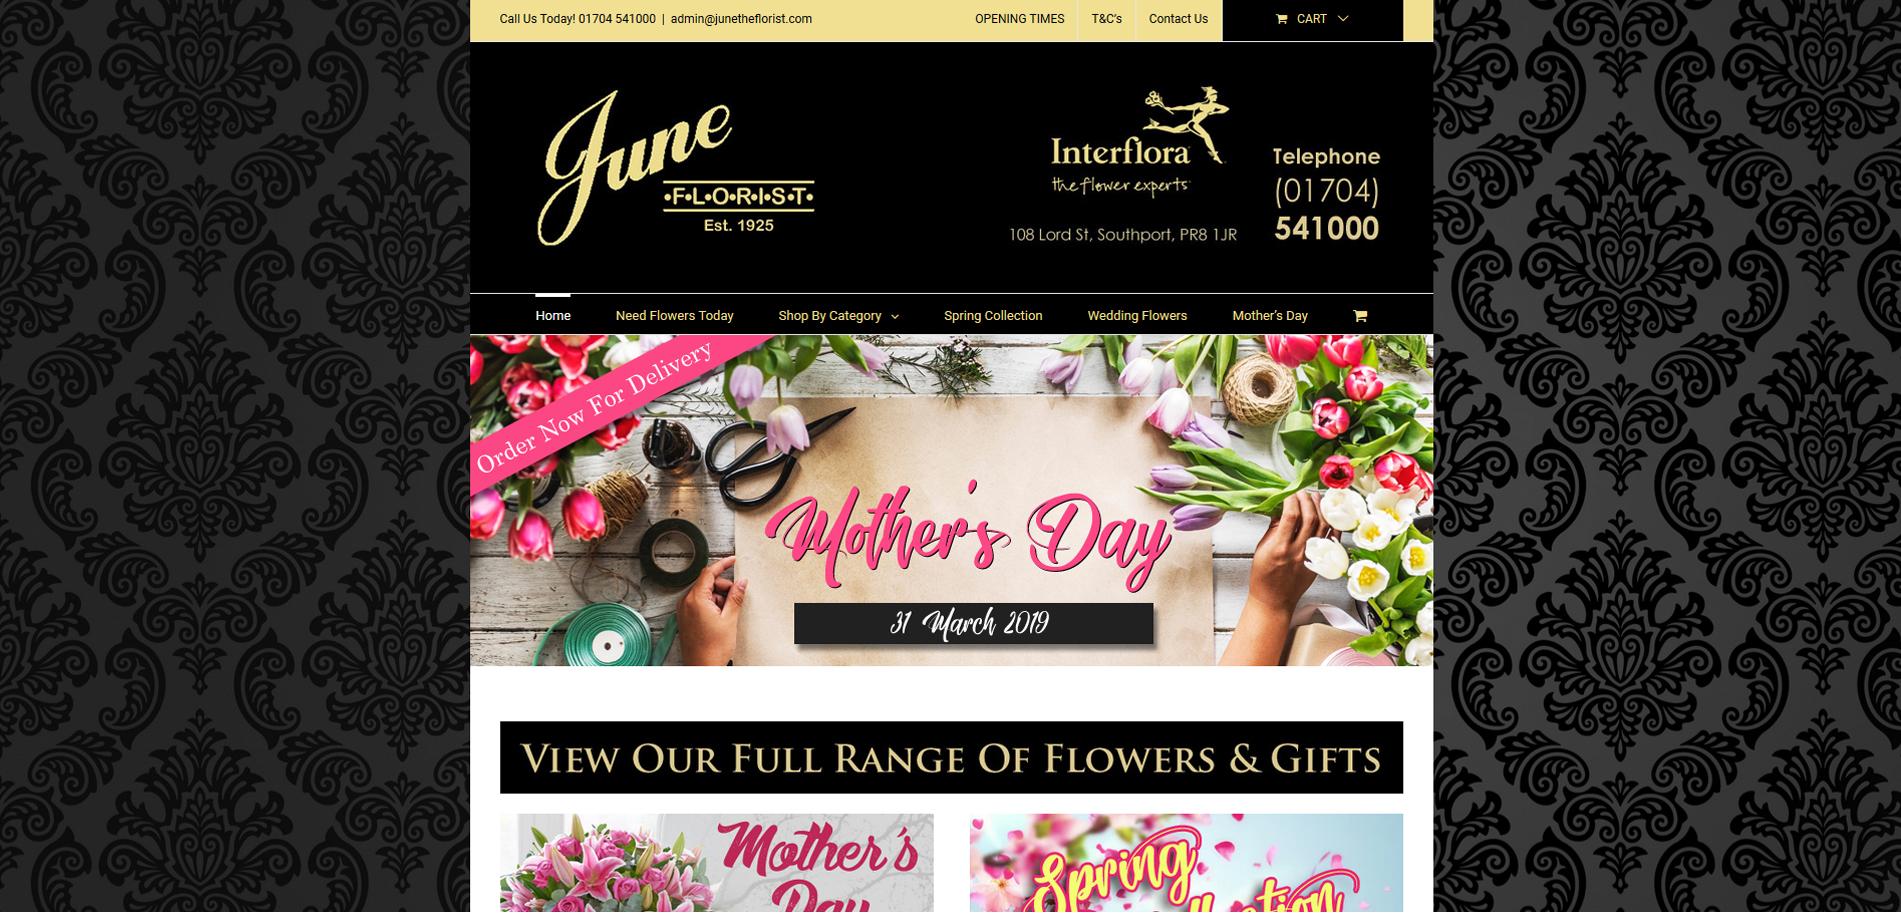 June The Florist